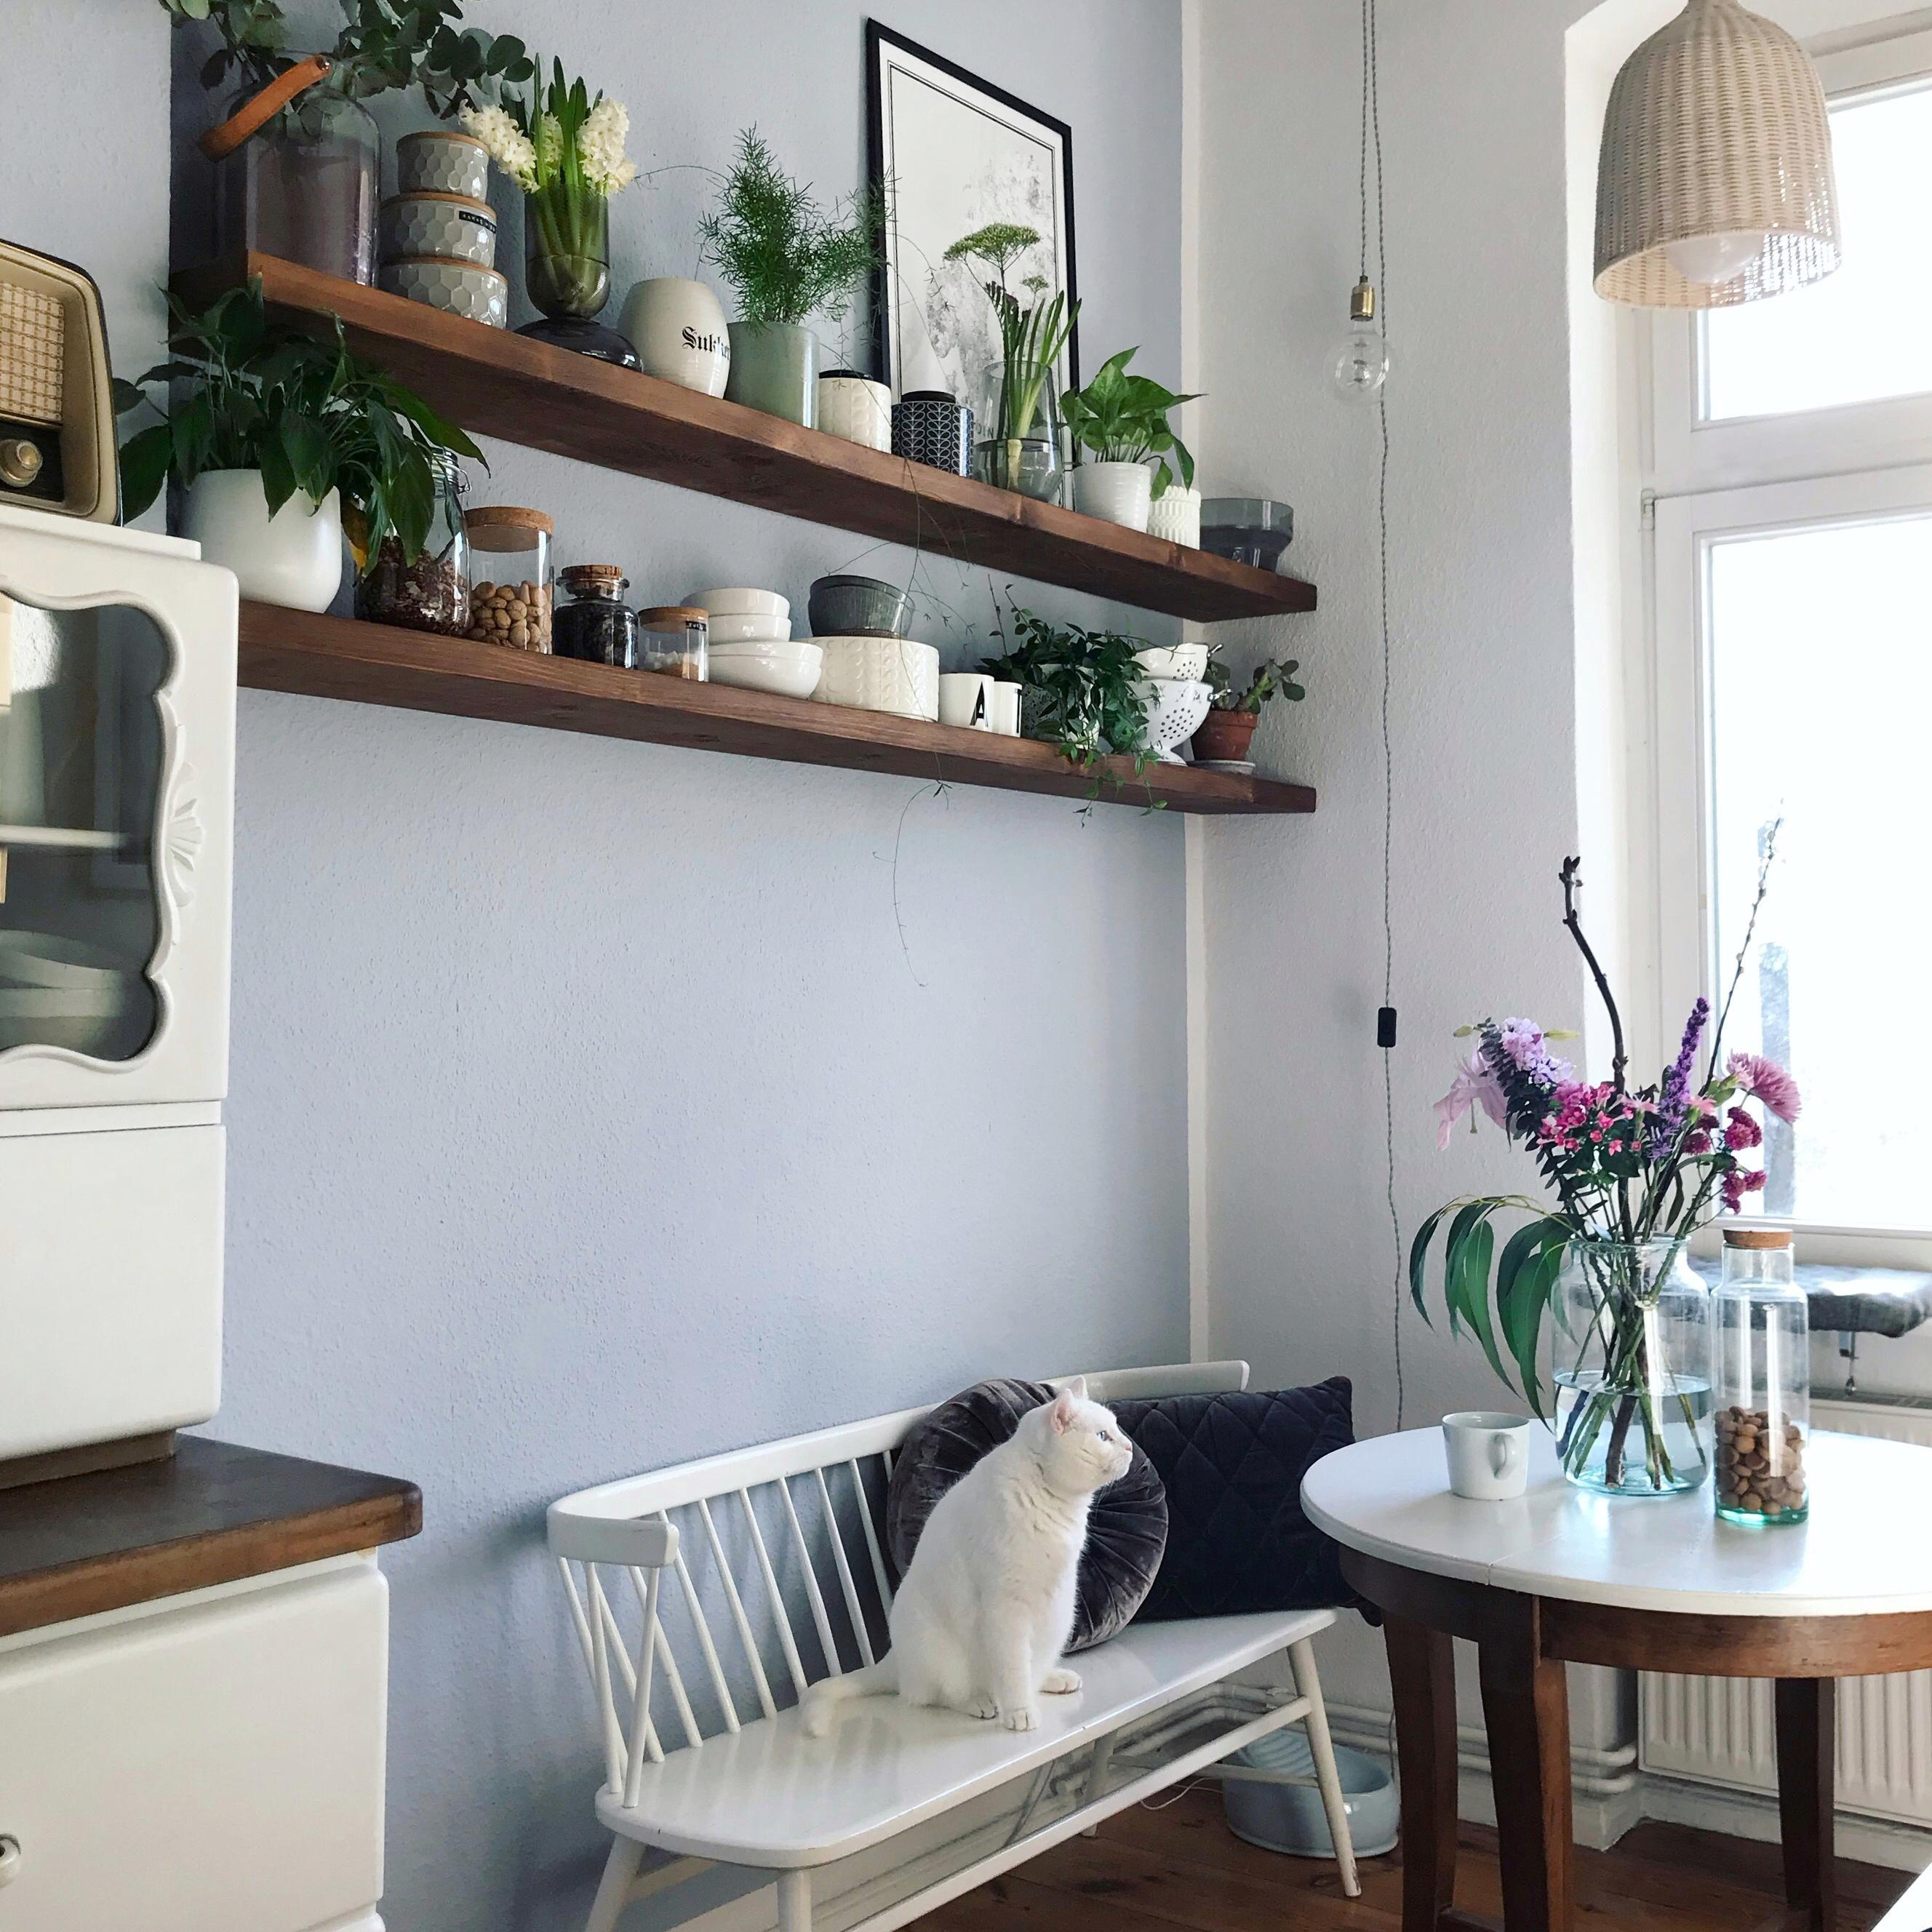 Wandregal • Bilder & Ideen • Couchstyle